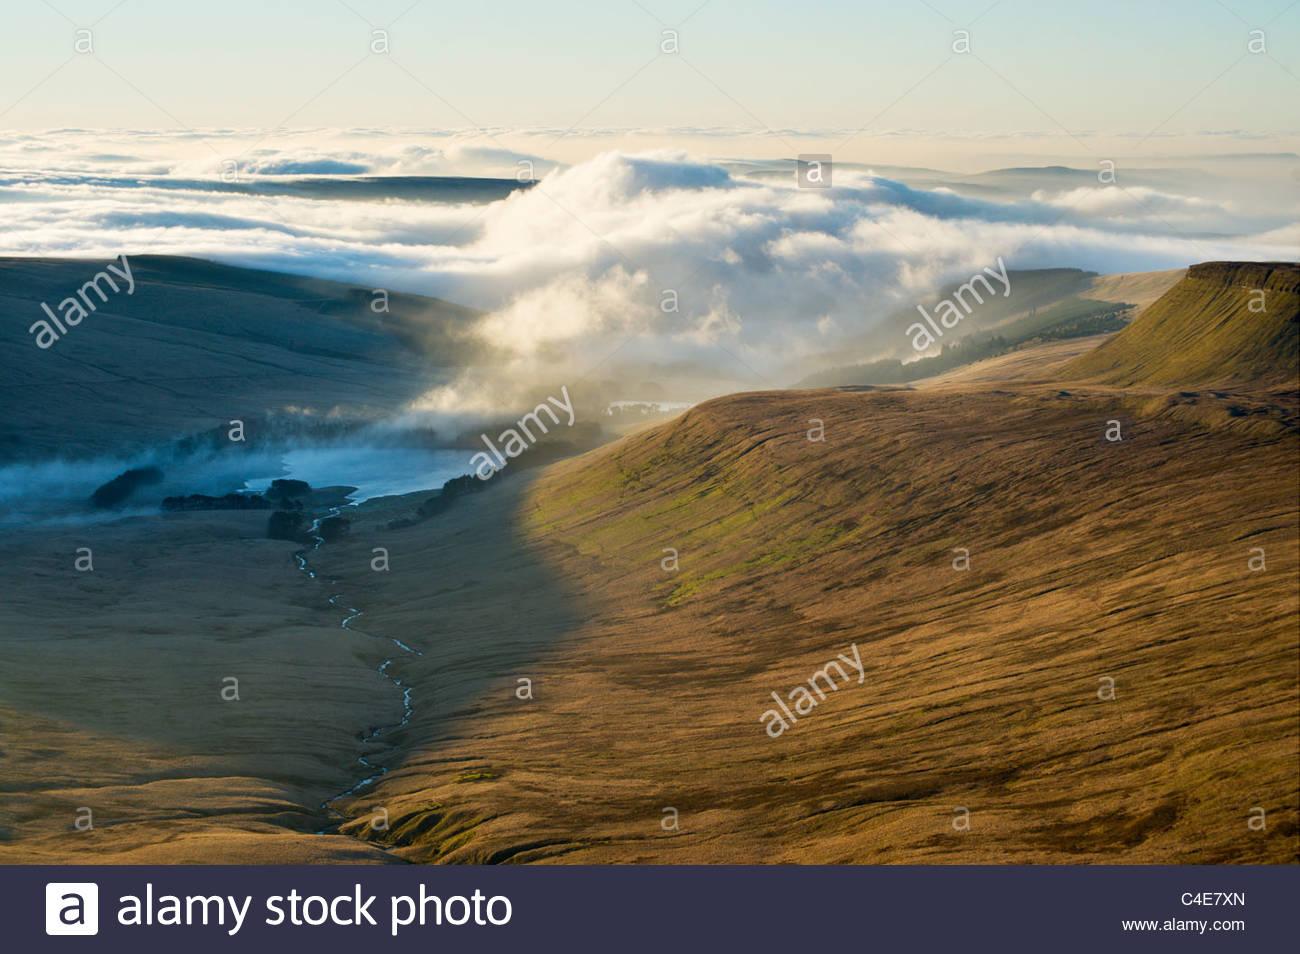 Nebel wirbelt um das Oberbecken Neuadd Brecon-Beacons-Nationalpark, South Wales. Stockbild